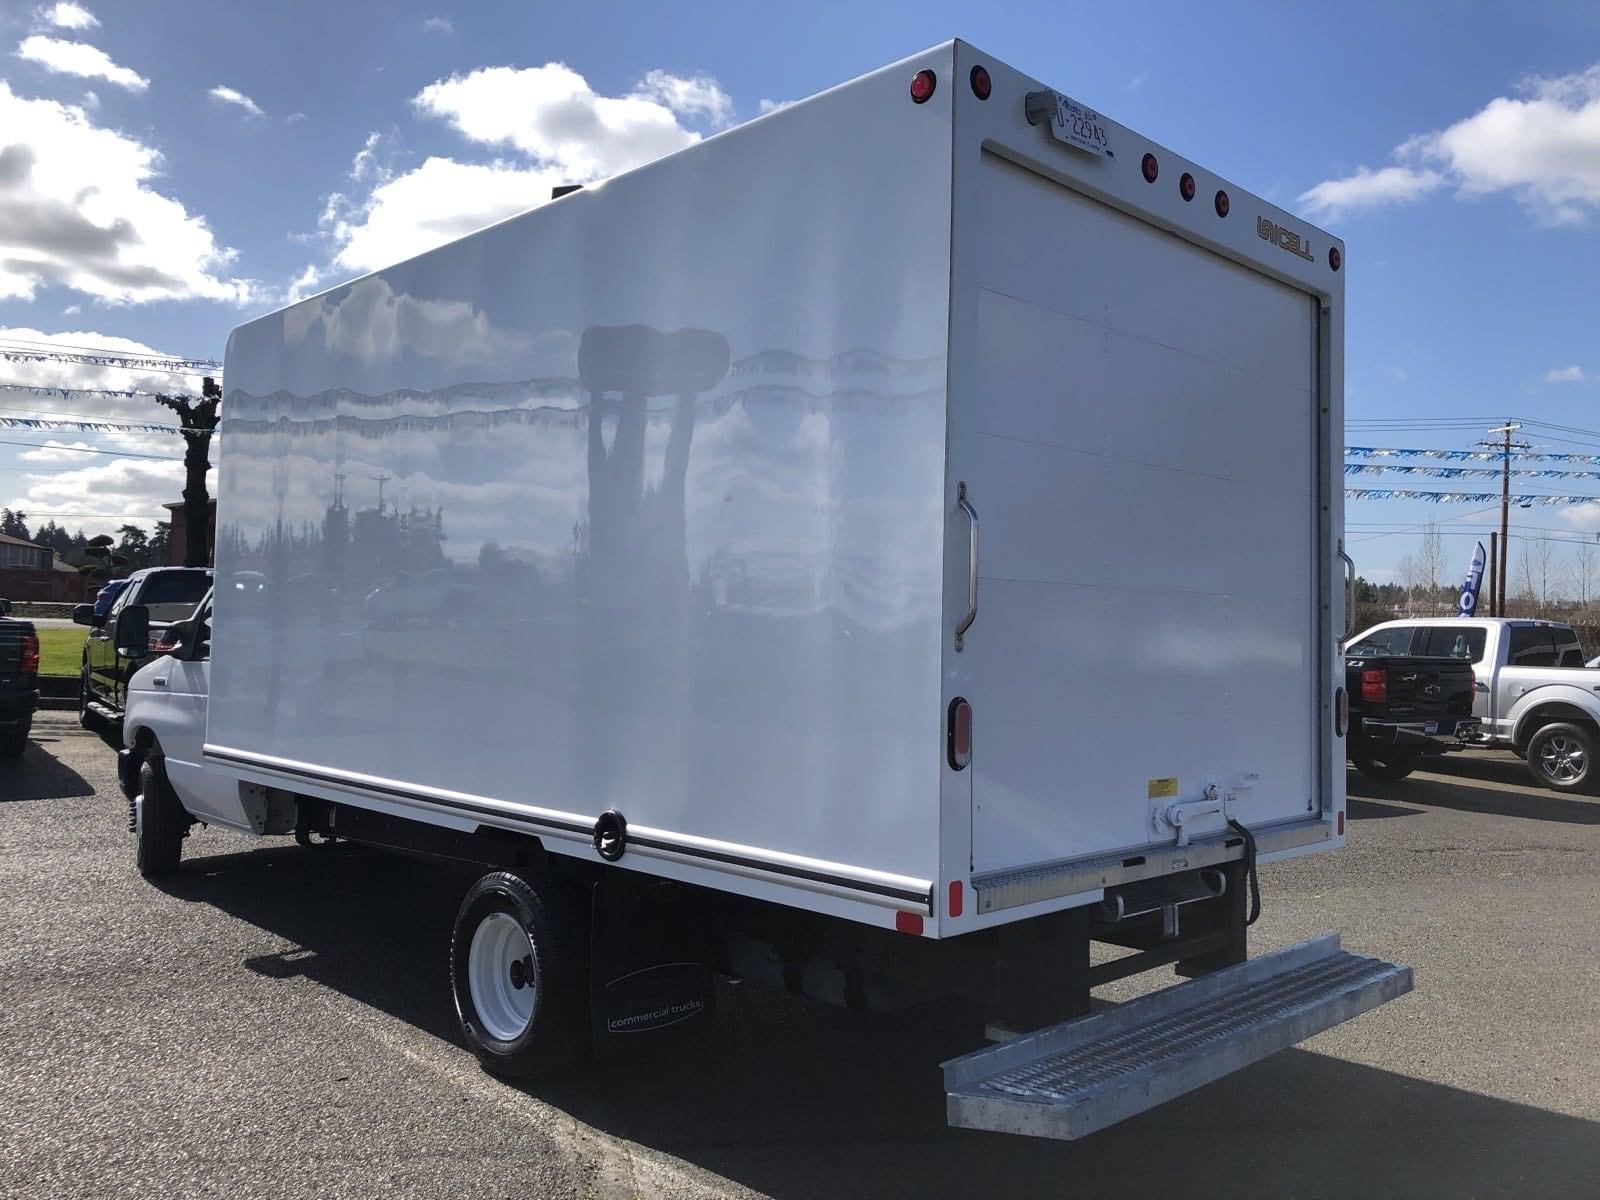 2019 Ford E-450 4x2, Cutaway Van #P13584 - photo 1